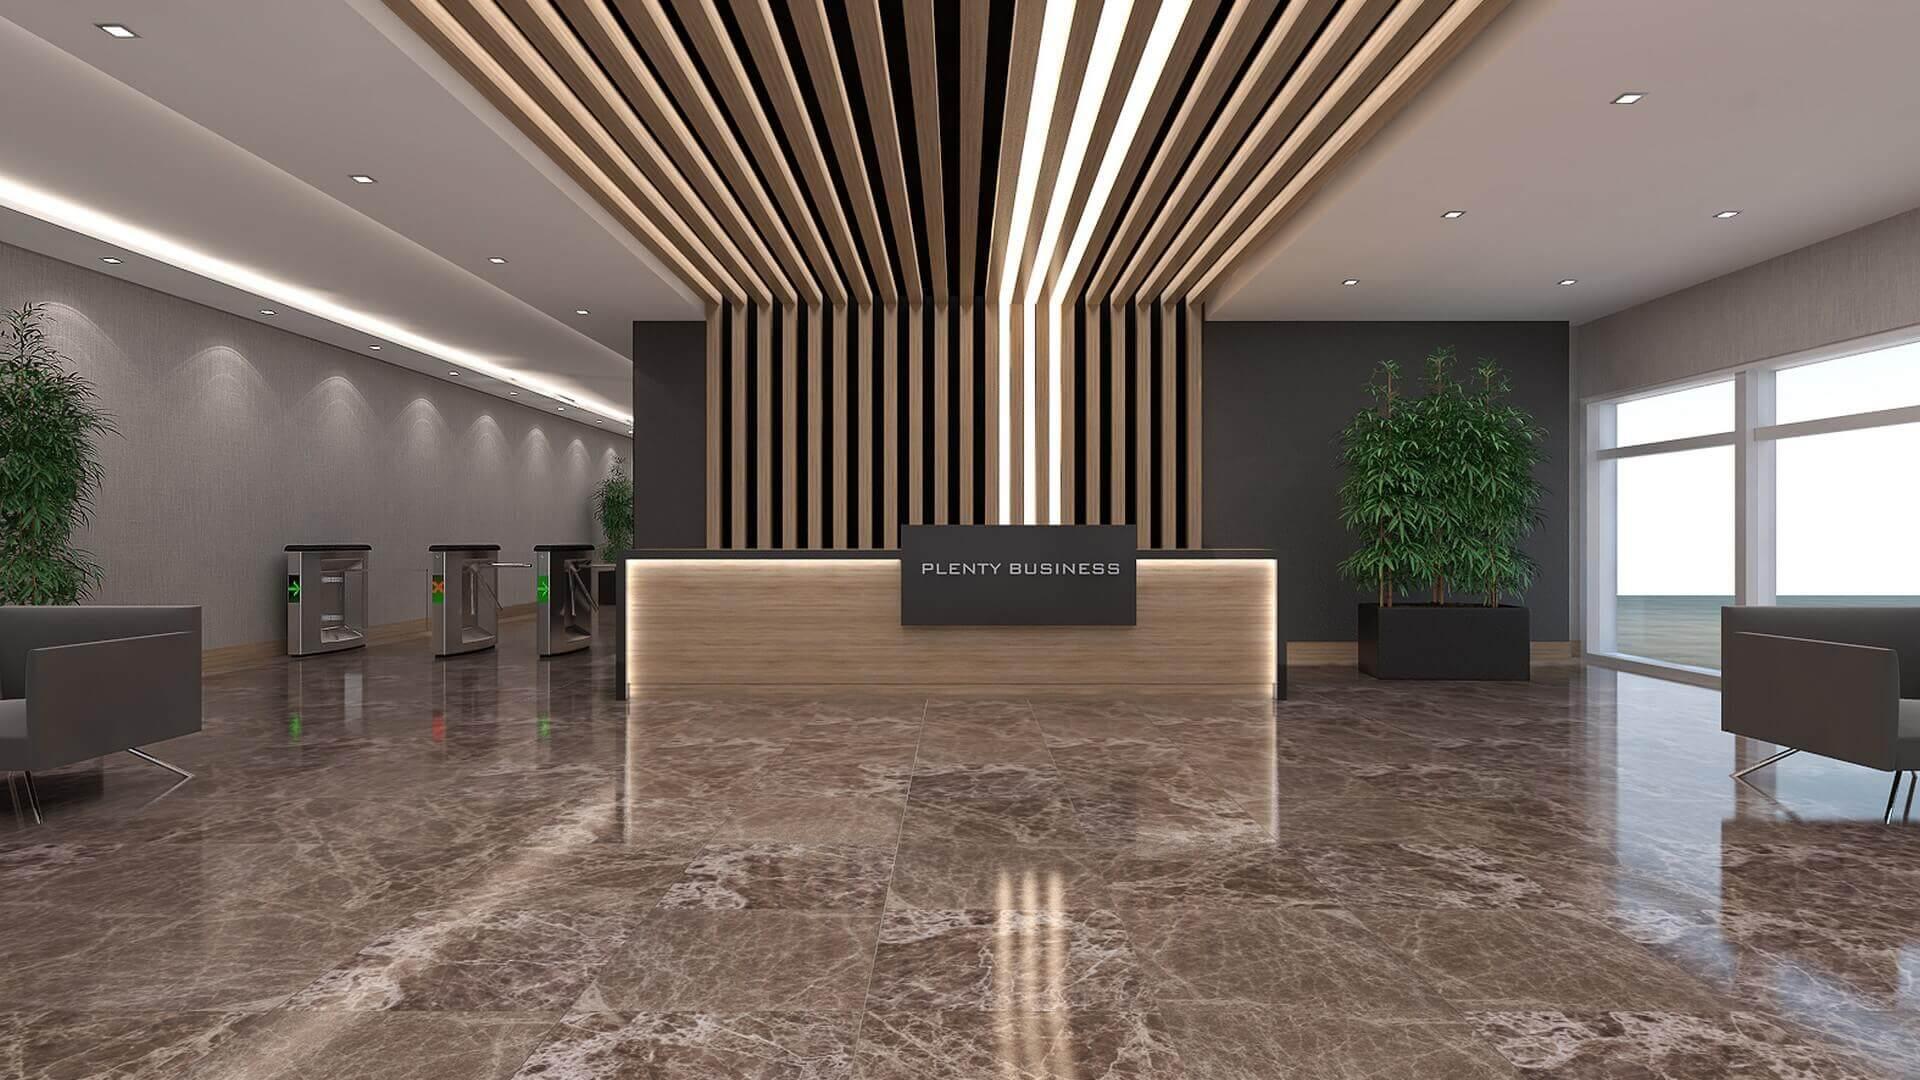 Balgat 2659 Plenty Business Offices